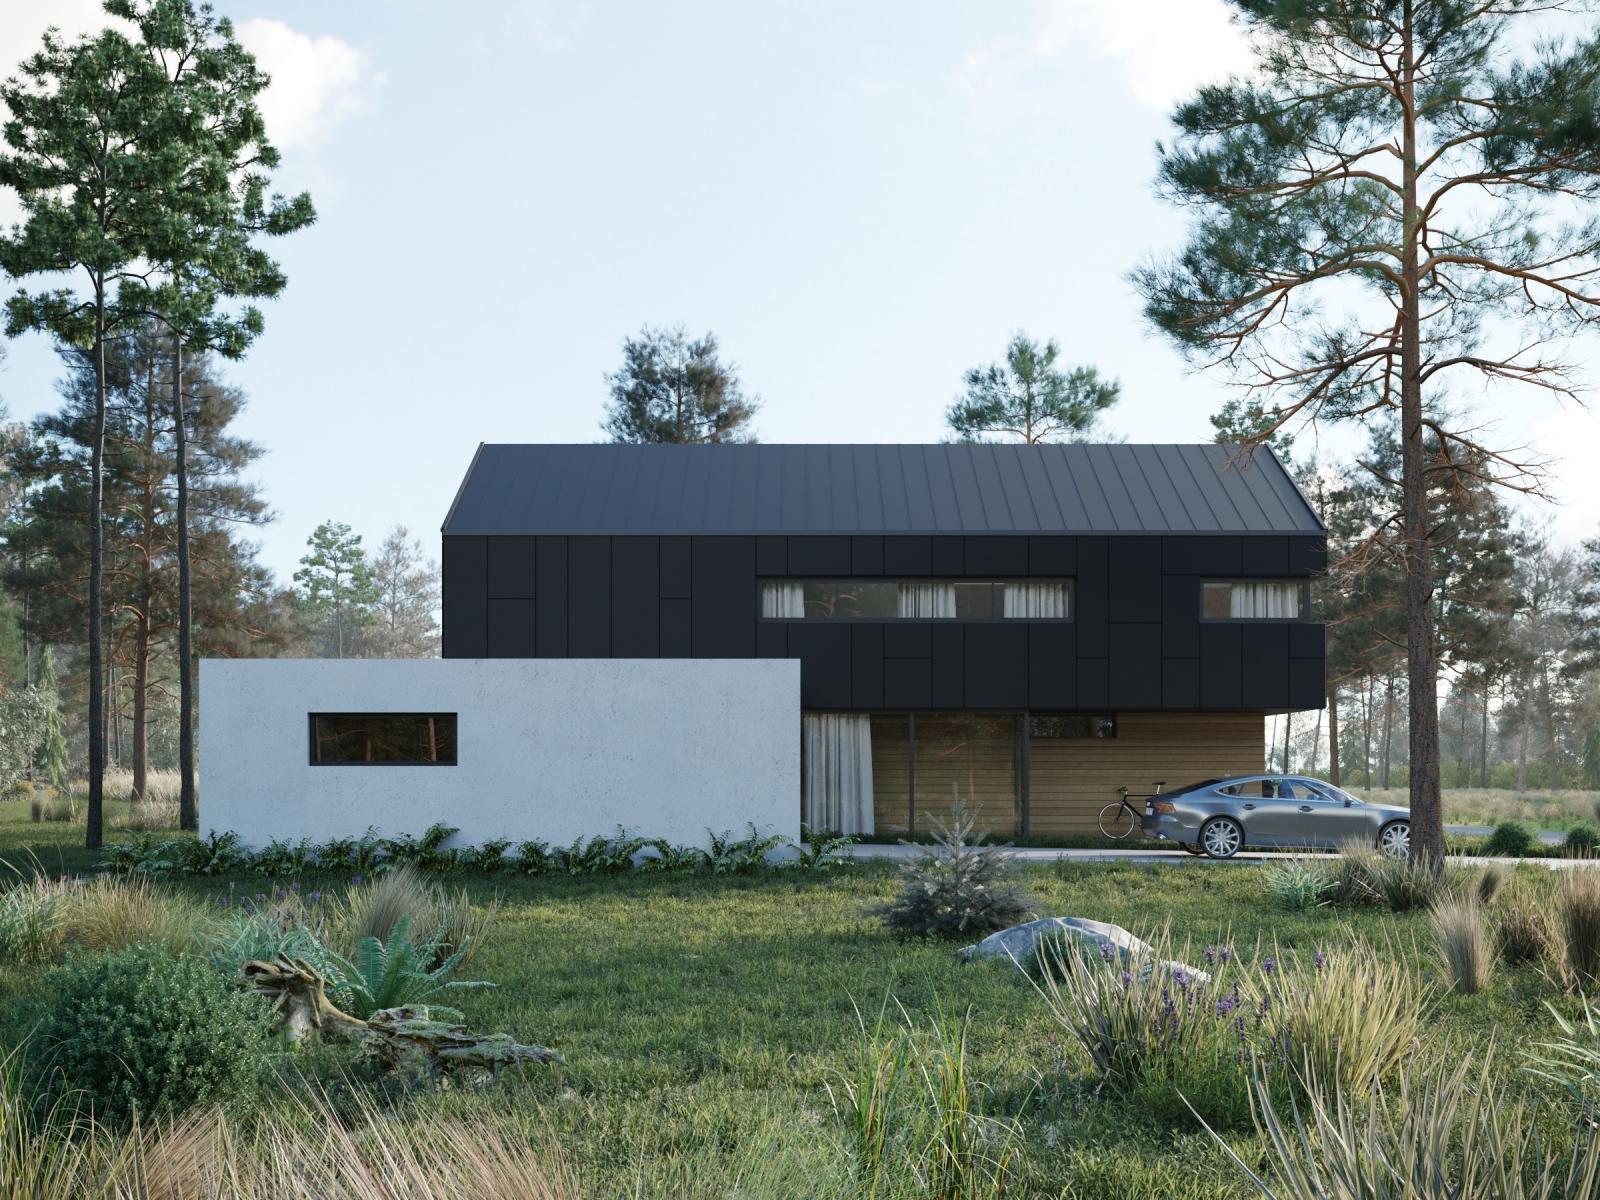 Visualization of a Black&White Home